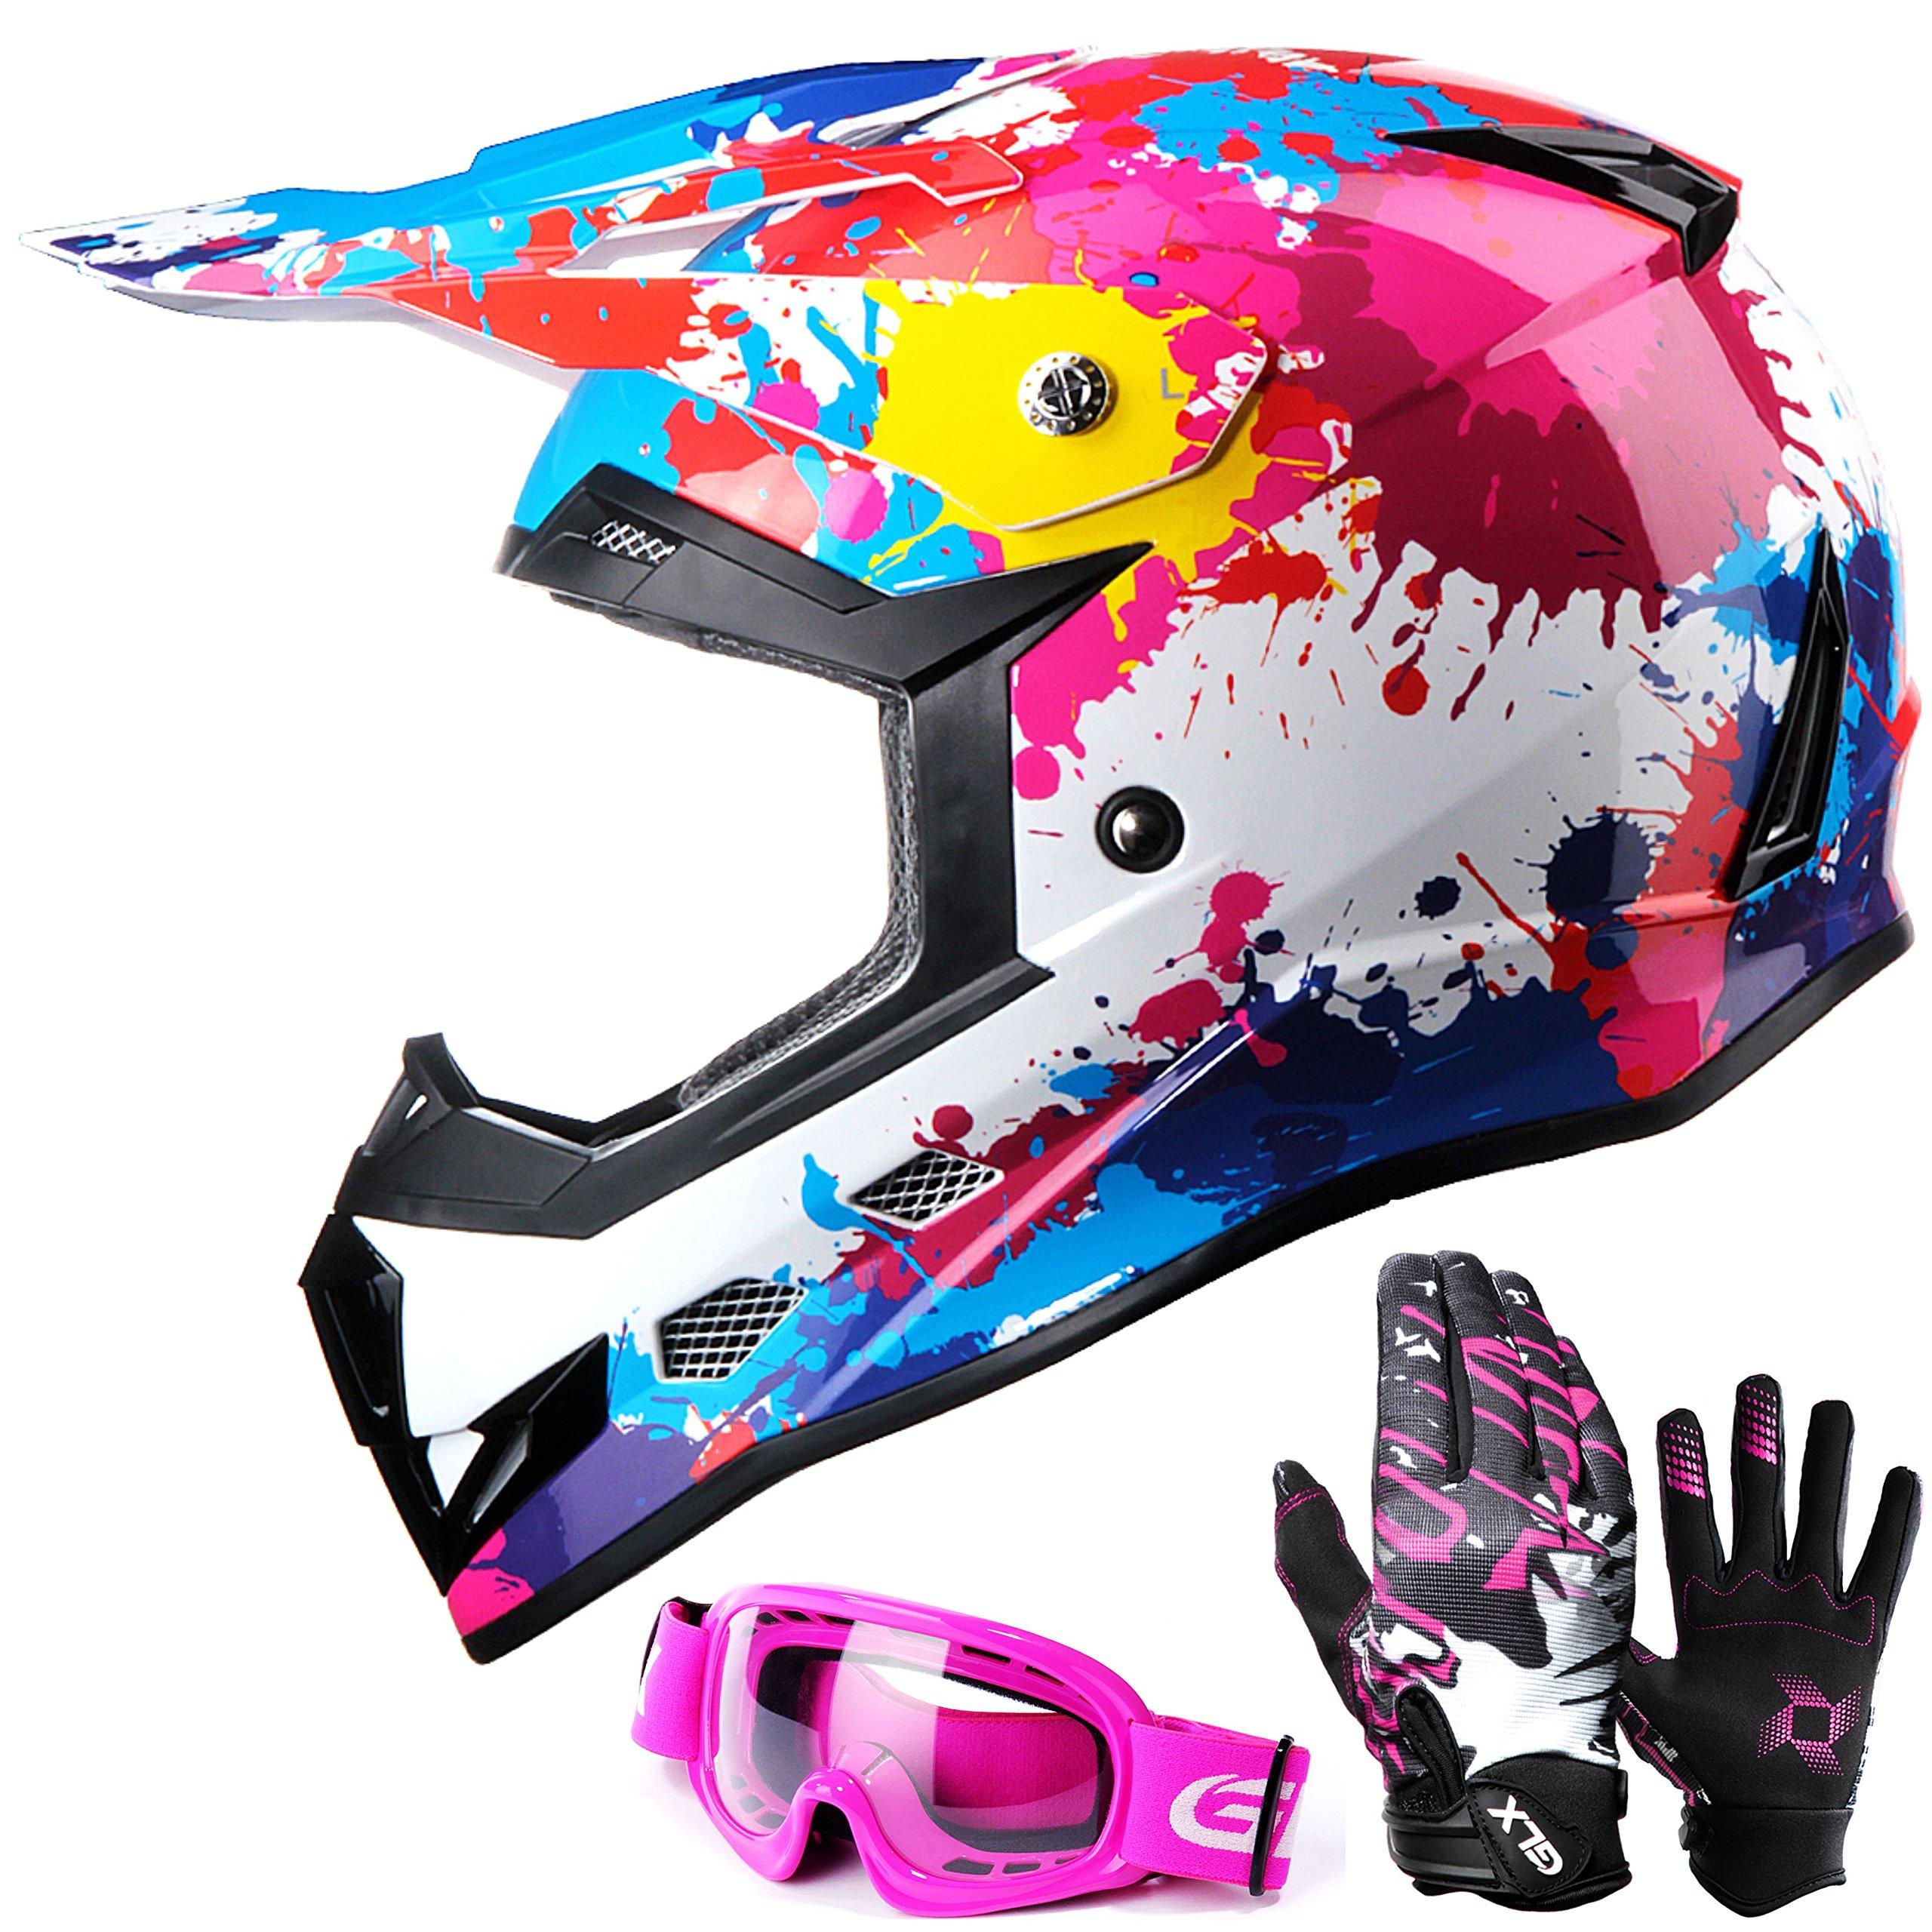 GLX DOT Youth Kids Motocross ATV Dirt Bike Helmet Off Road Graffiti Pink+Goggles+Gloves (L)